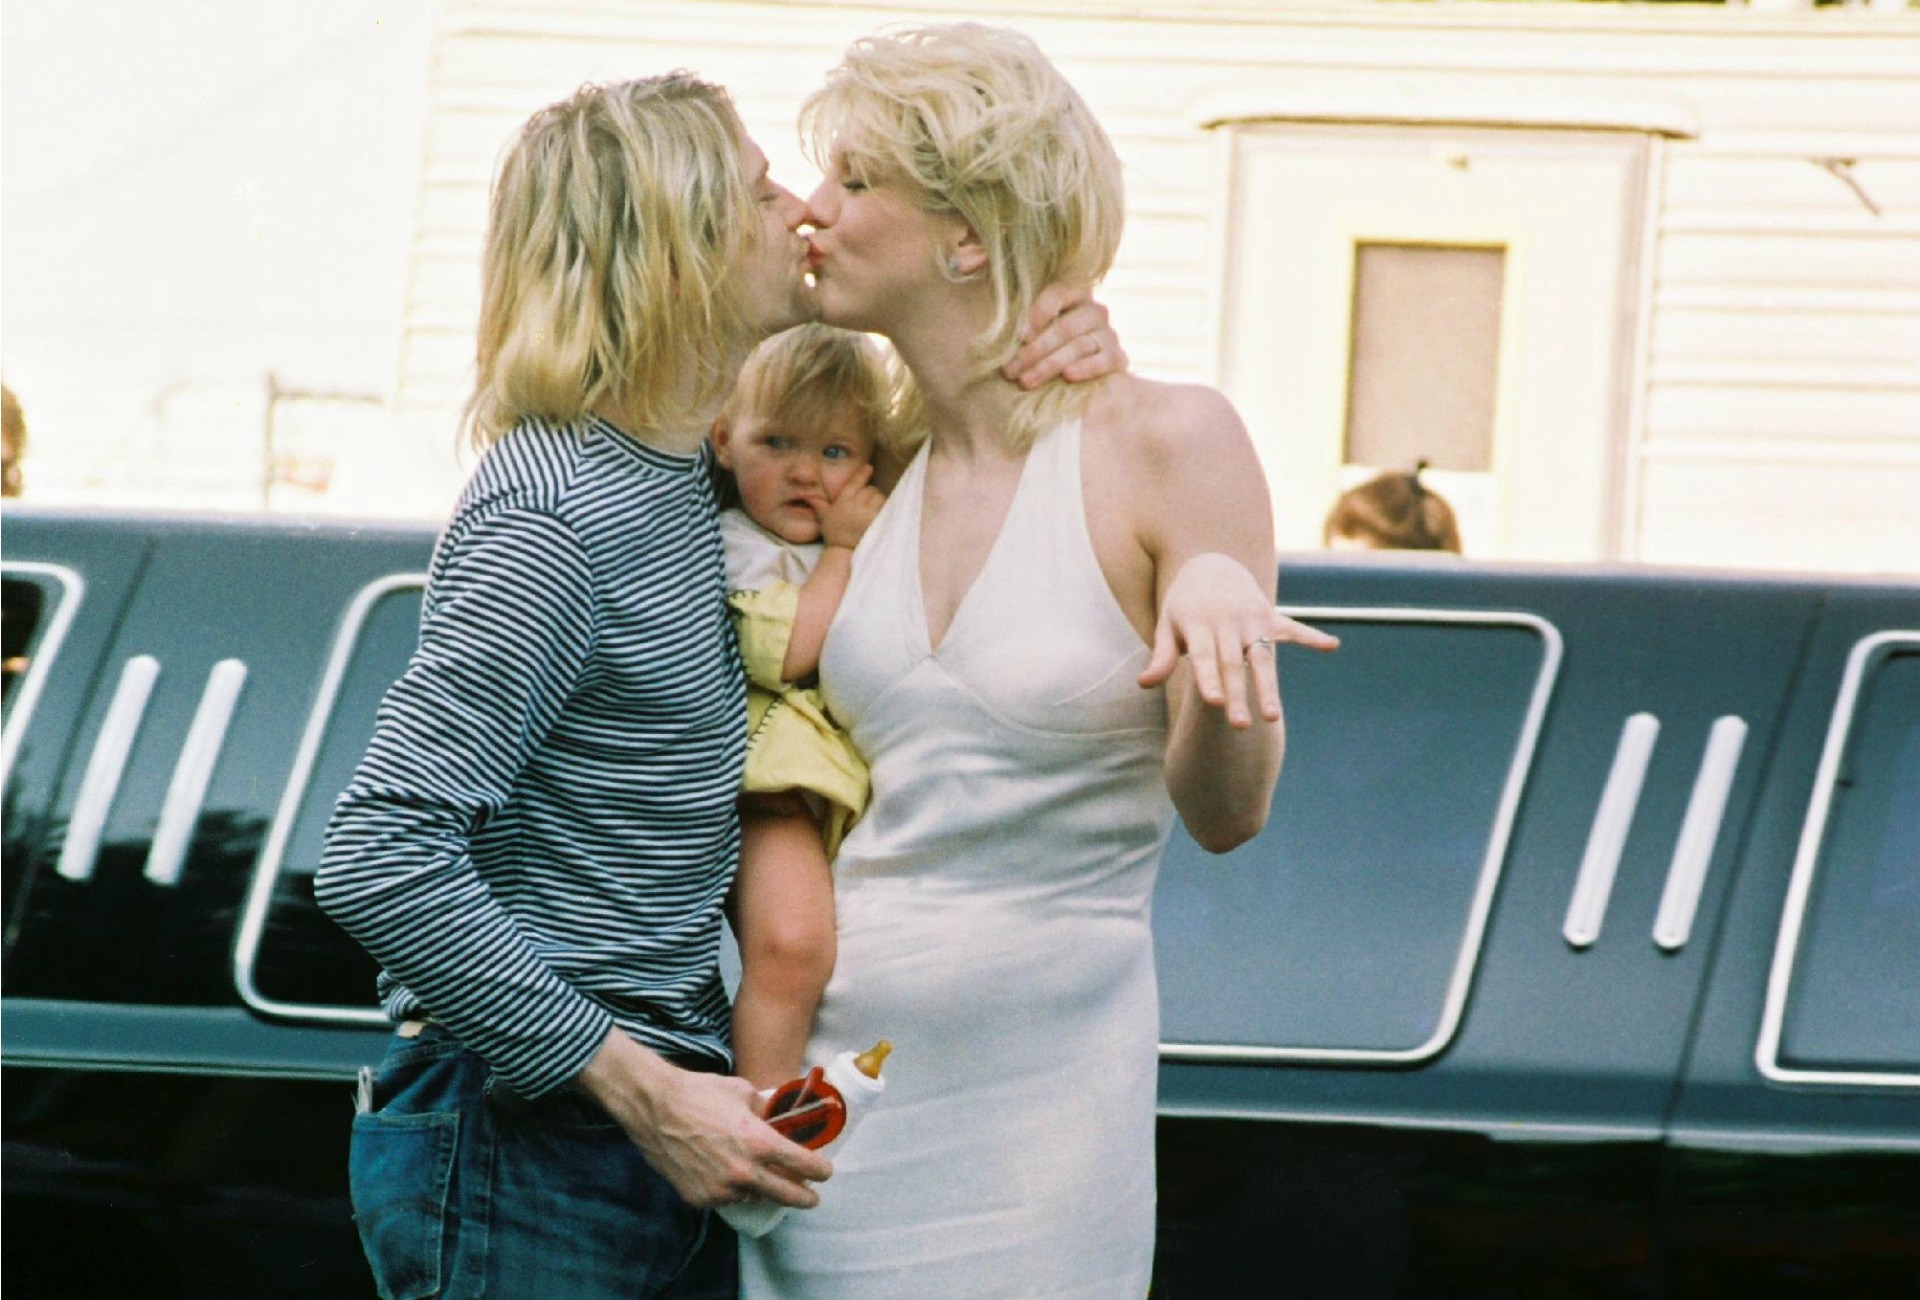 Courtney Love And Kurt Cobain Wedding.Kurt Cobain Read His Scornful Note Mocking Courtney Love